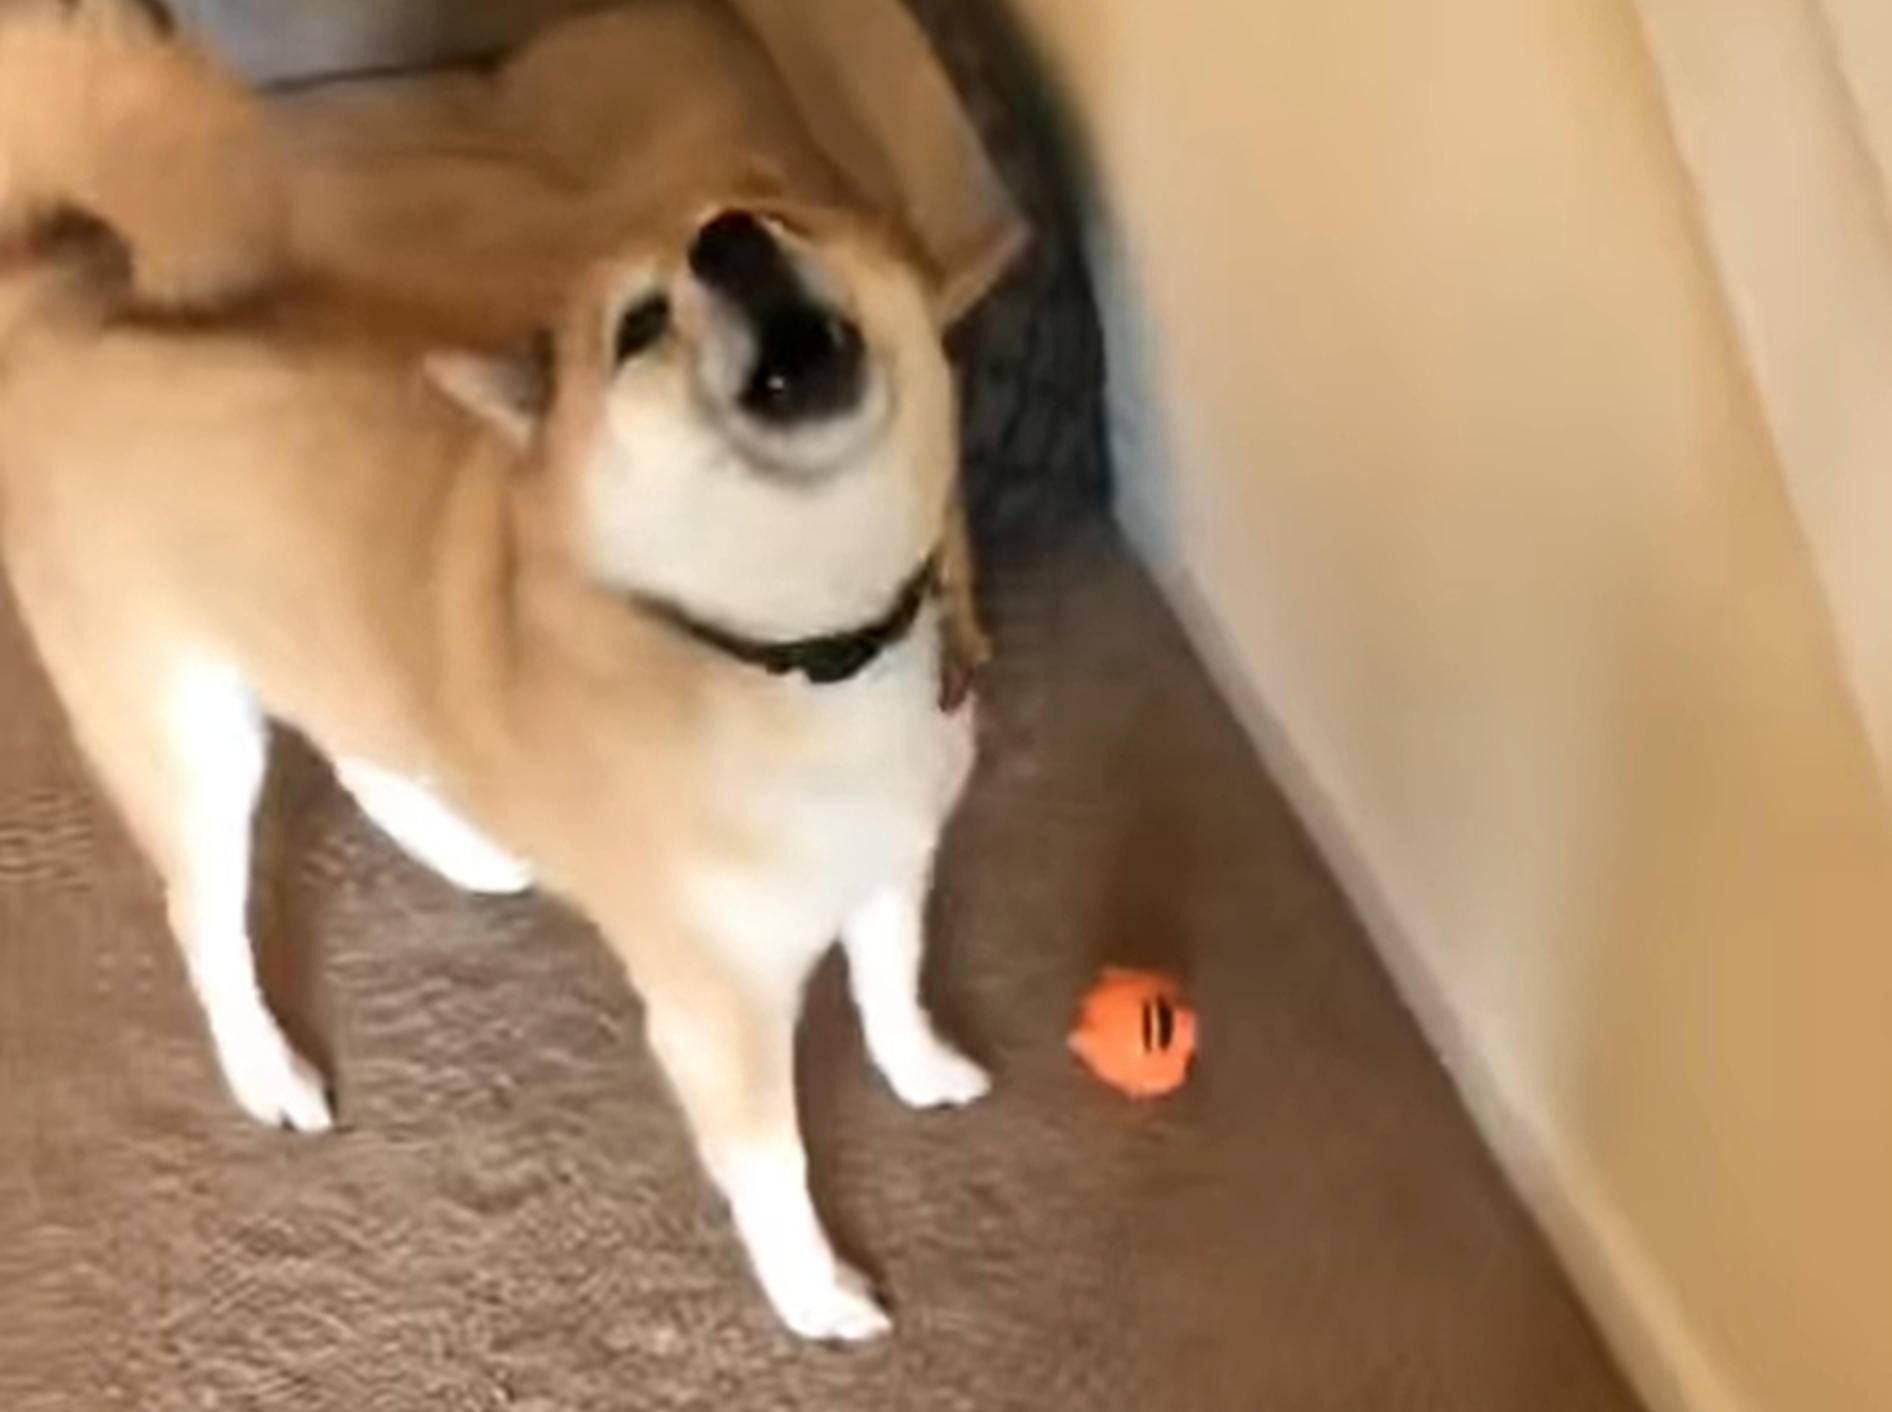 Shiba begeistert mit lustigem Geräusch - Bild: YouTube/The Adventures of Mandy and Major